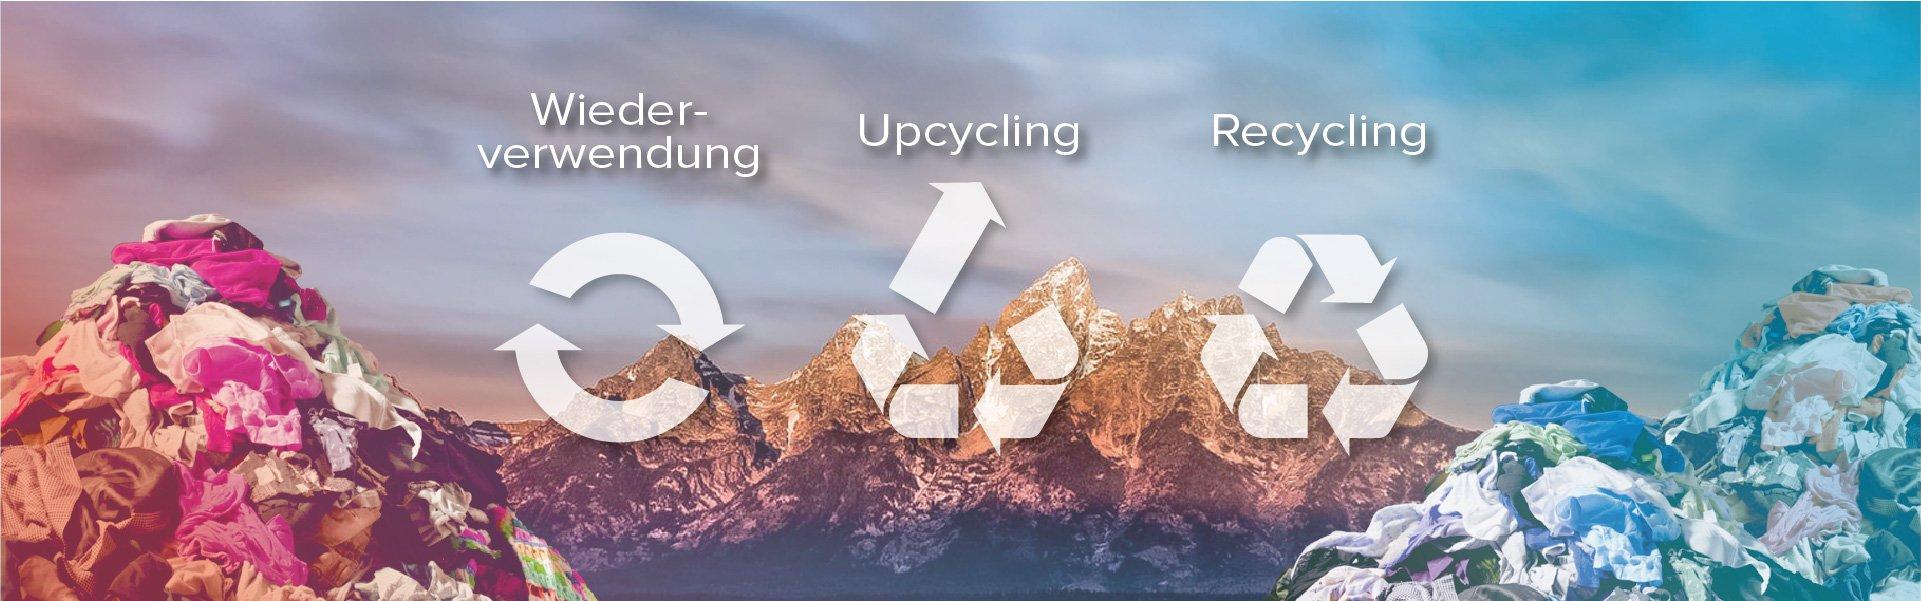 Wiederverwendung, Upcycling und Recycling von Berufsbekleidung-Recycling Upcycling Wiederverwendung lang